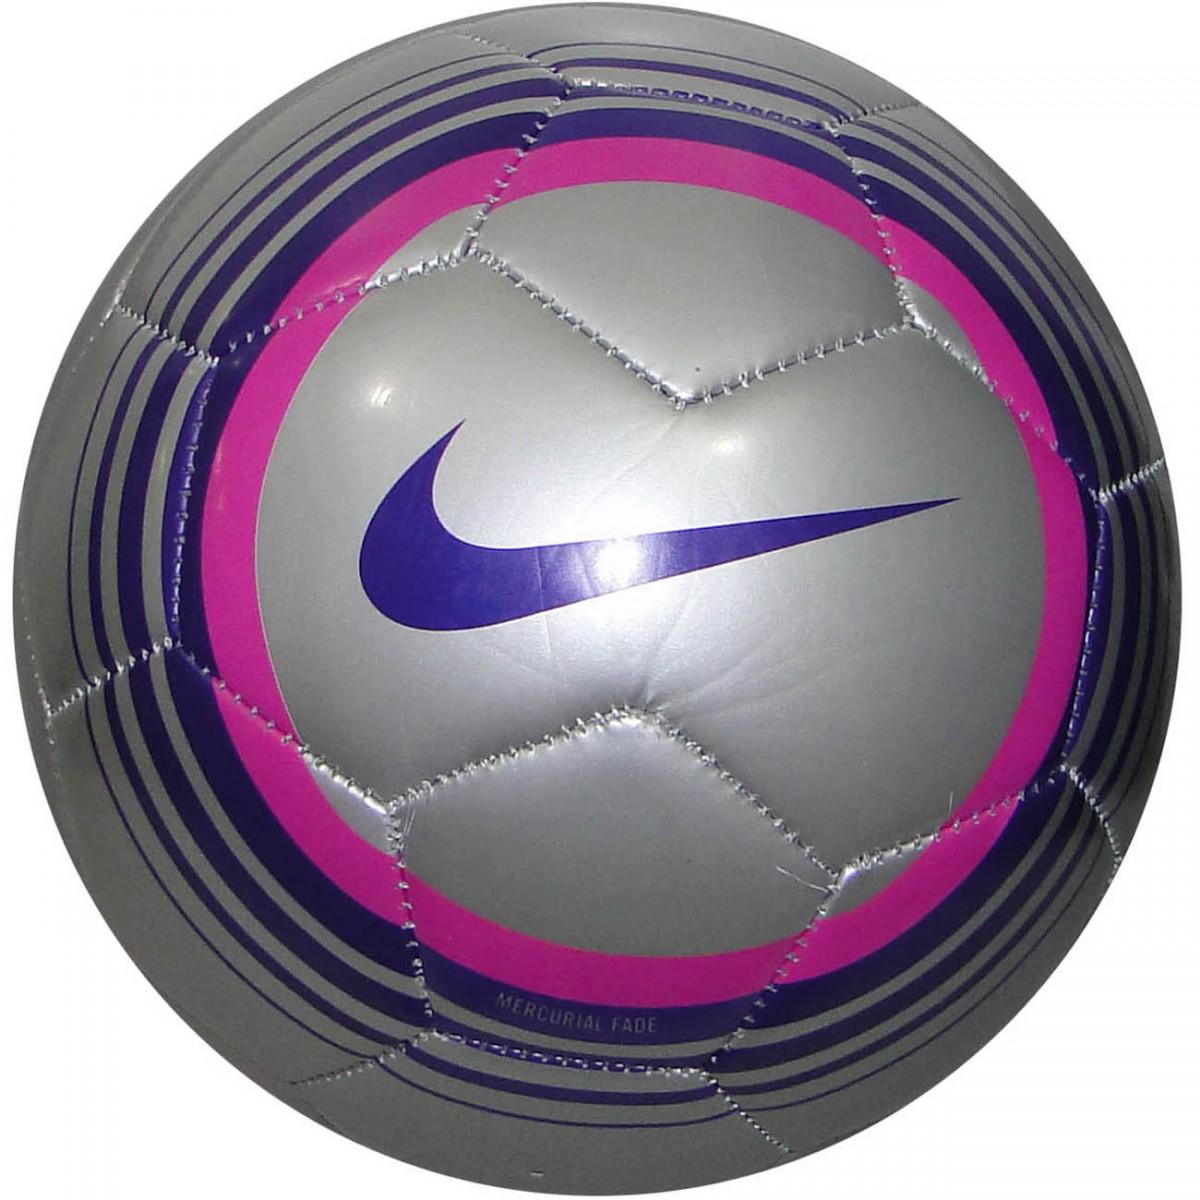 Bola Nike Mercurial Fade 2639 - PRATA ROXO - Chuteira Nike b1bf28cca6899